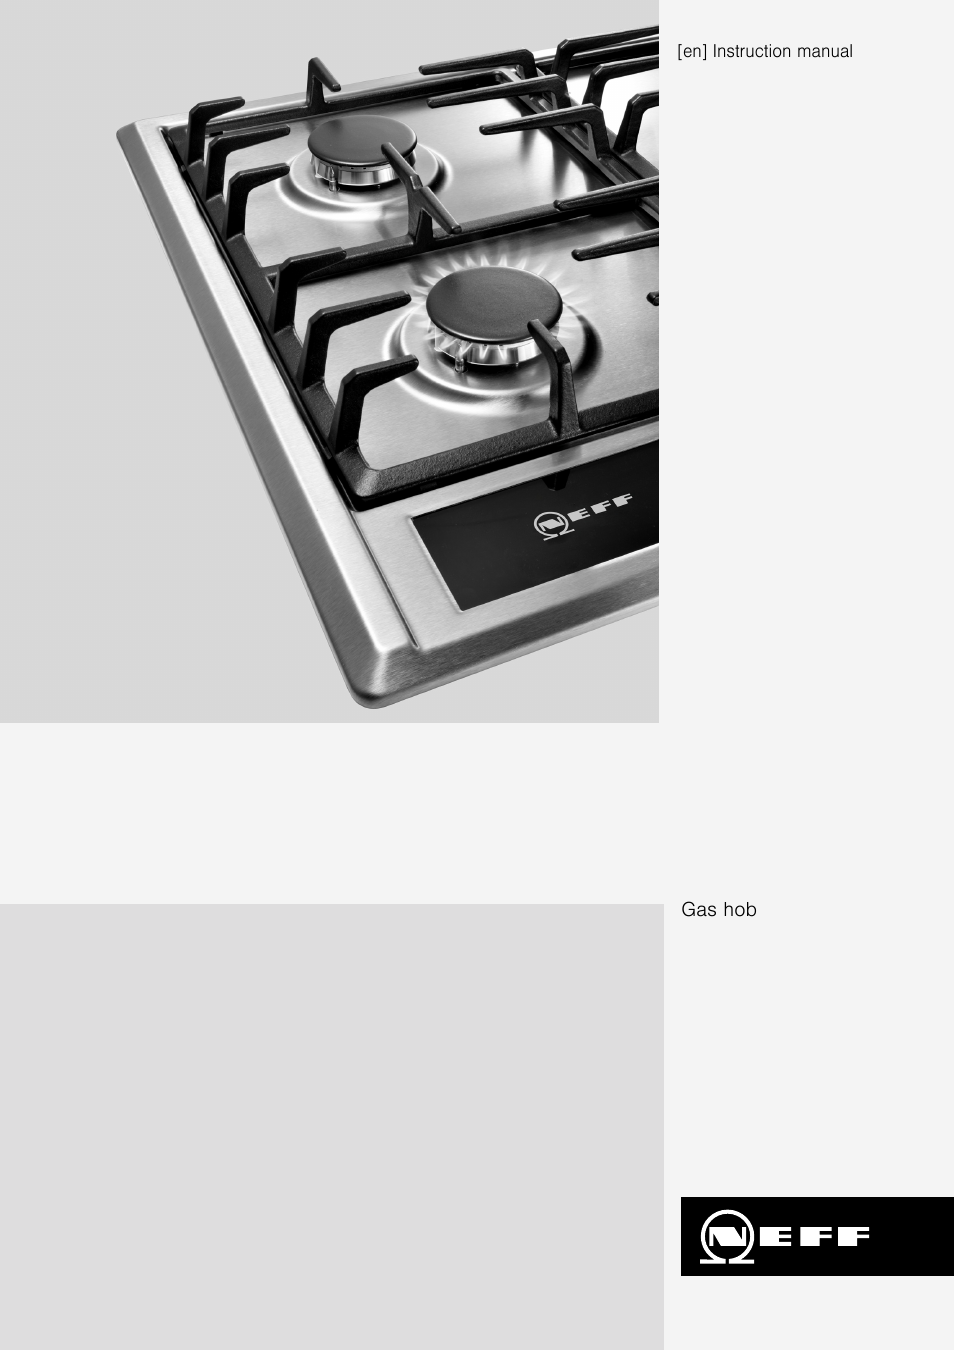 neff t23s36n0gb user manual 10 pages also for t25s56n0gb rh manualsdir com Standing Gas Hob Teka Hob Gas